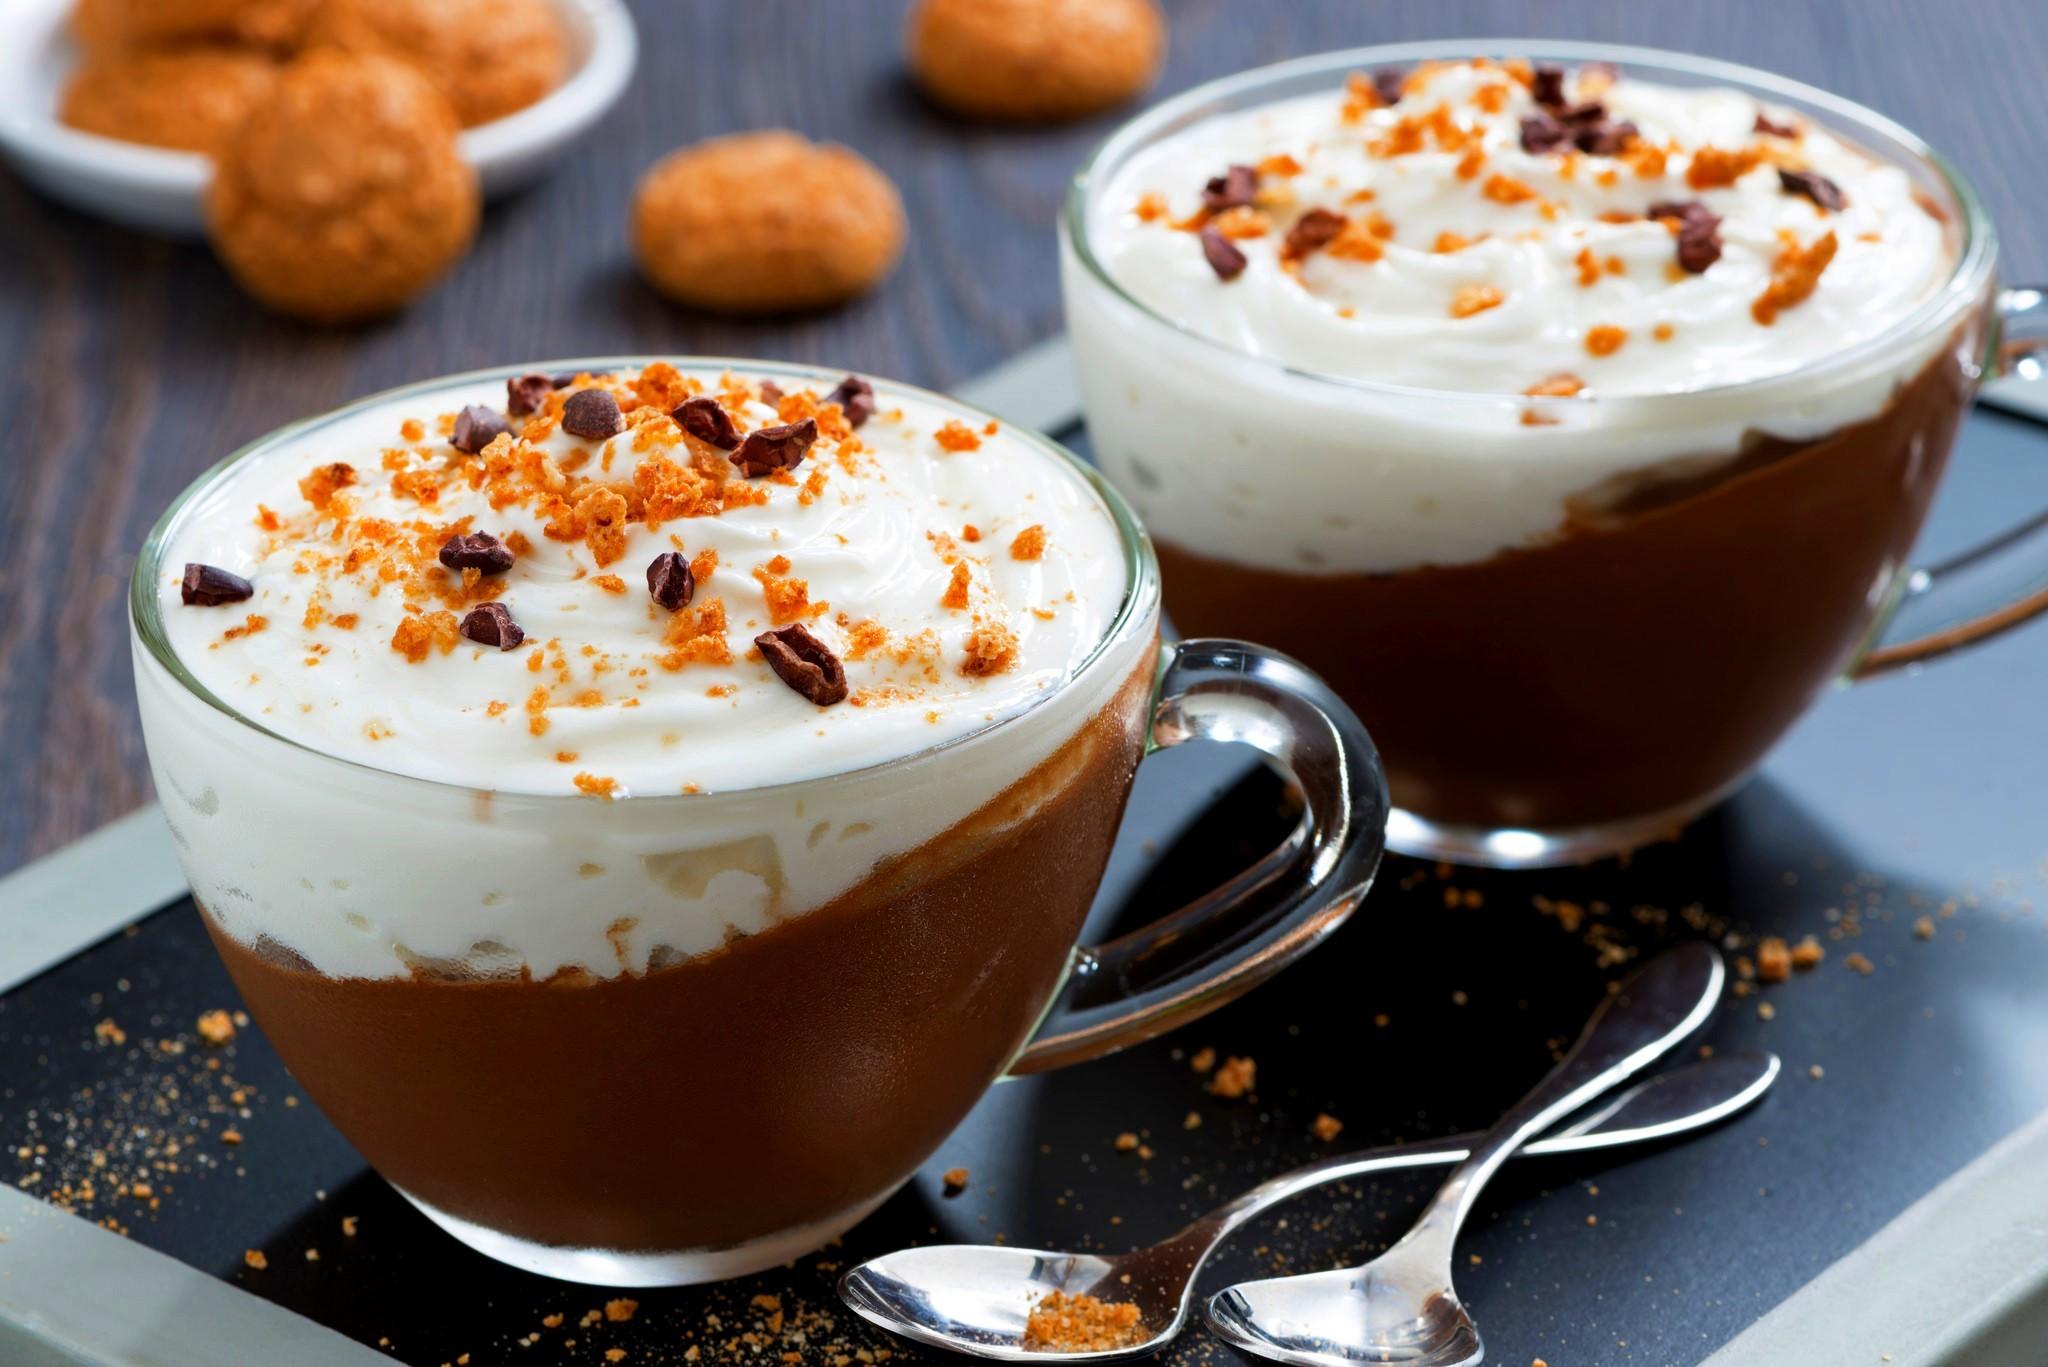 кофе со сладостями  № 140238 бесплатно